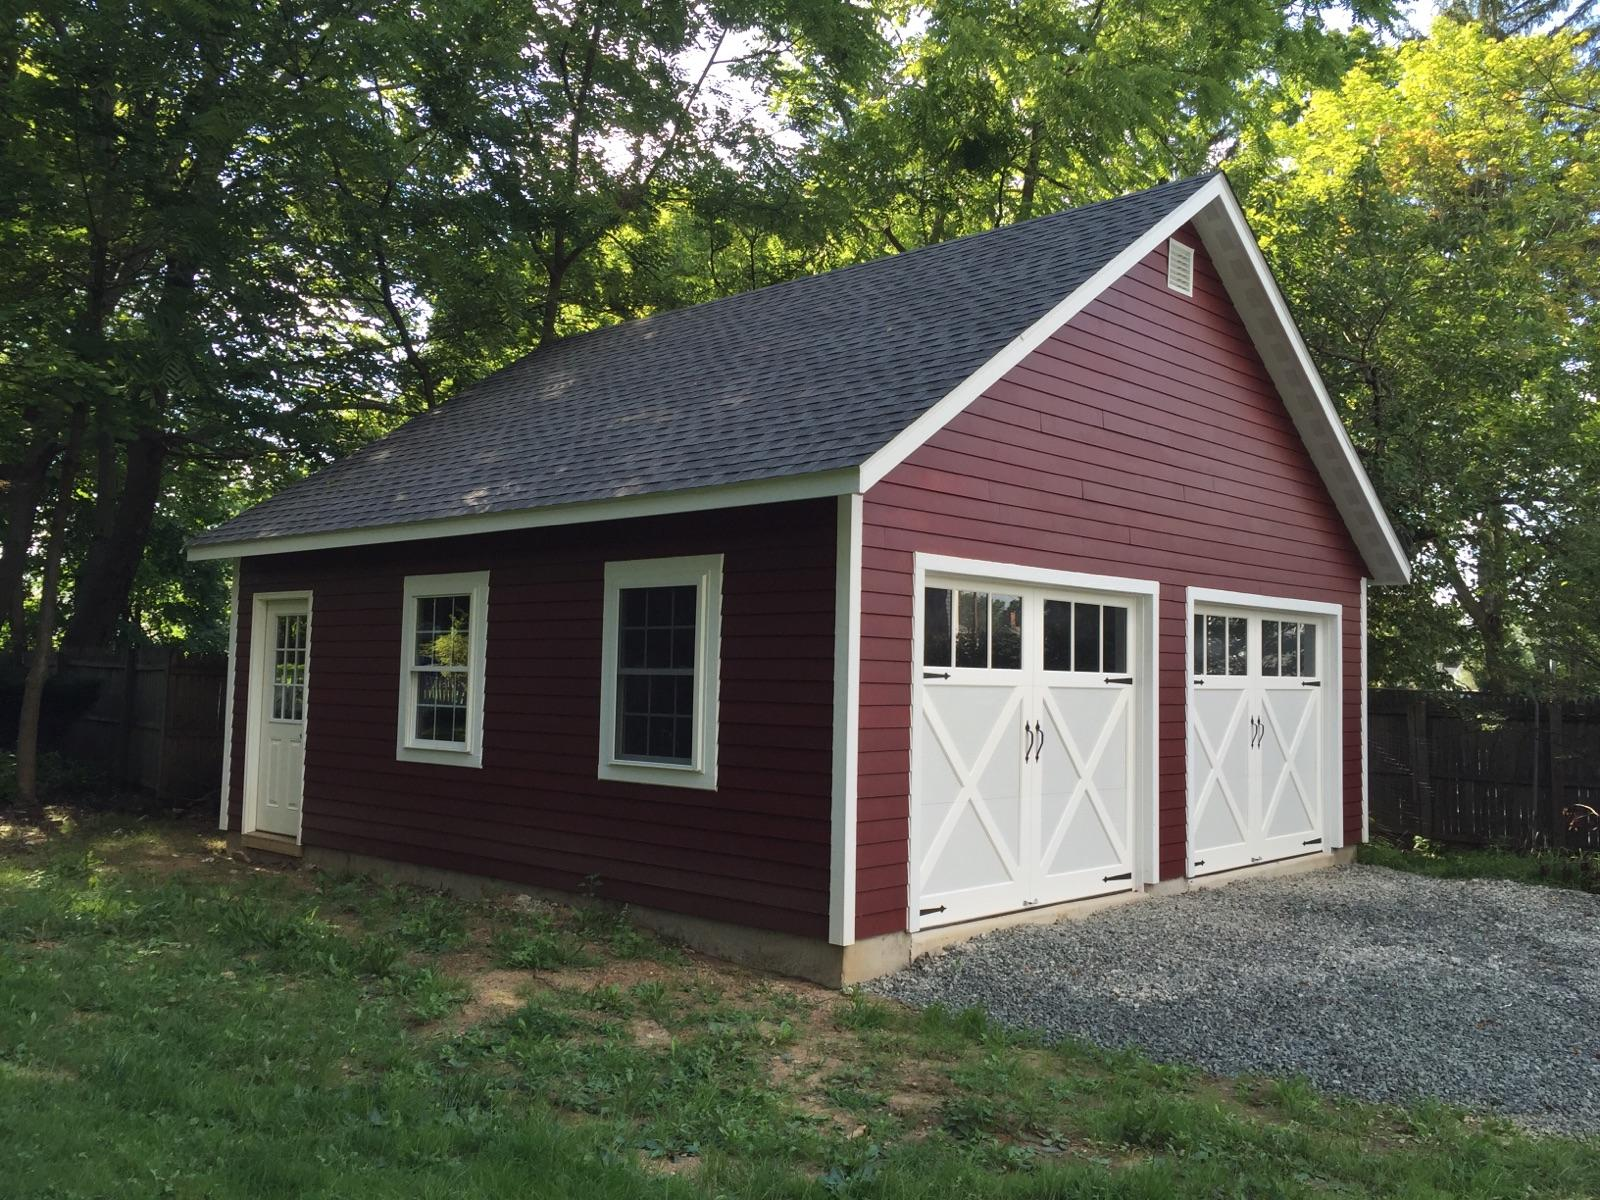 amish econo new sheds garages cape lancaster storage built outdoor garage provider jersey custom gazebos